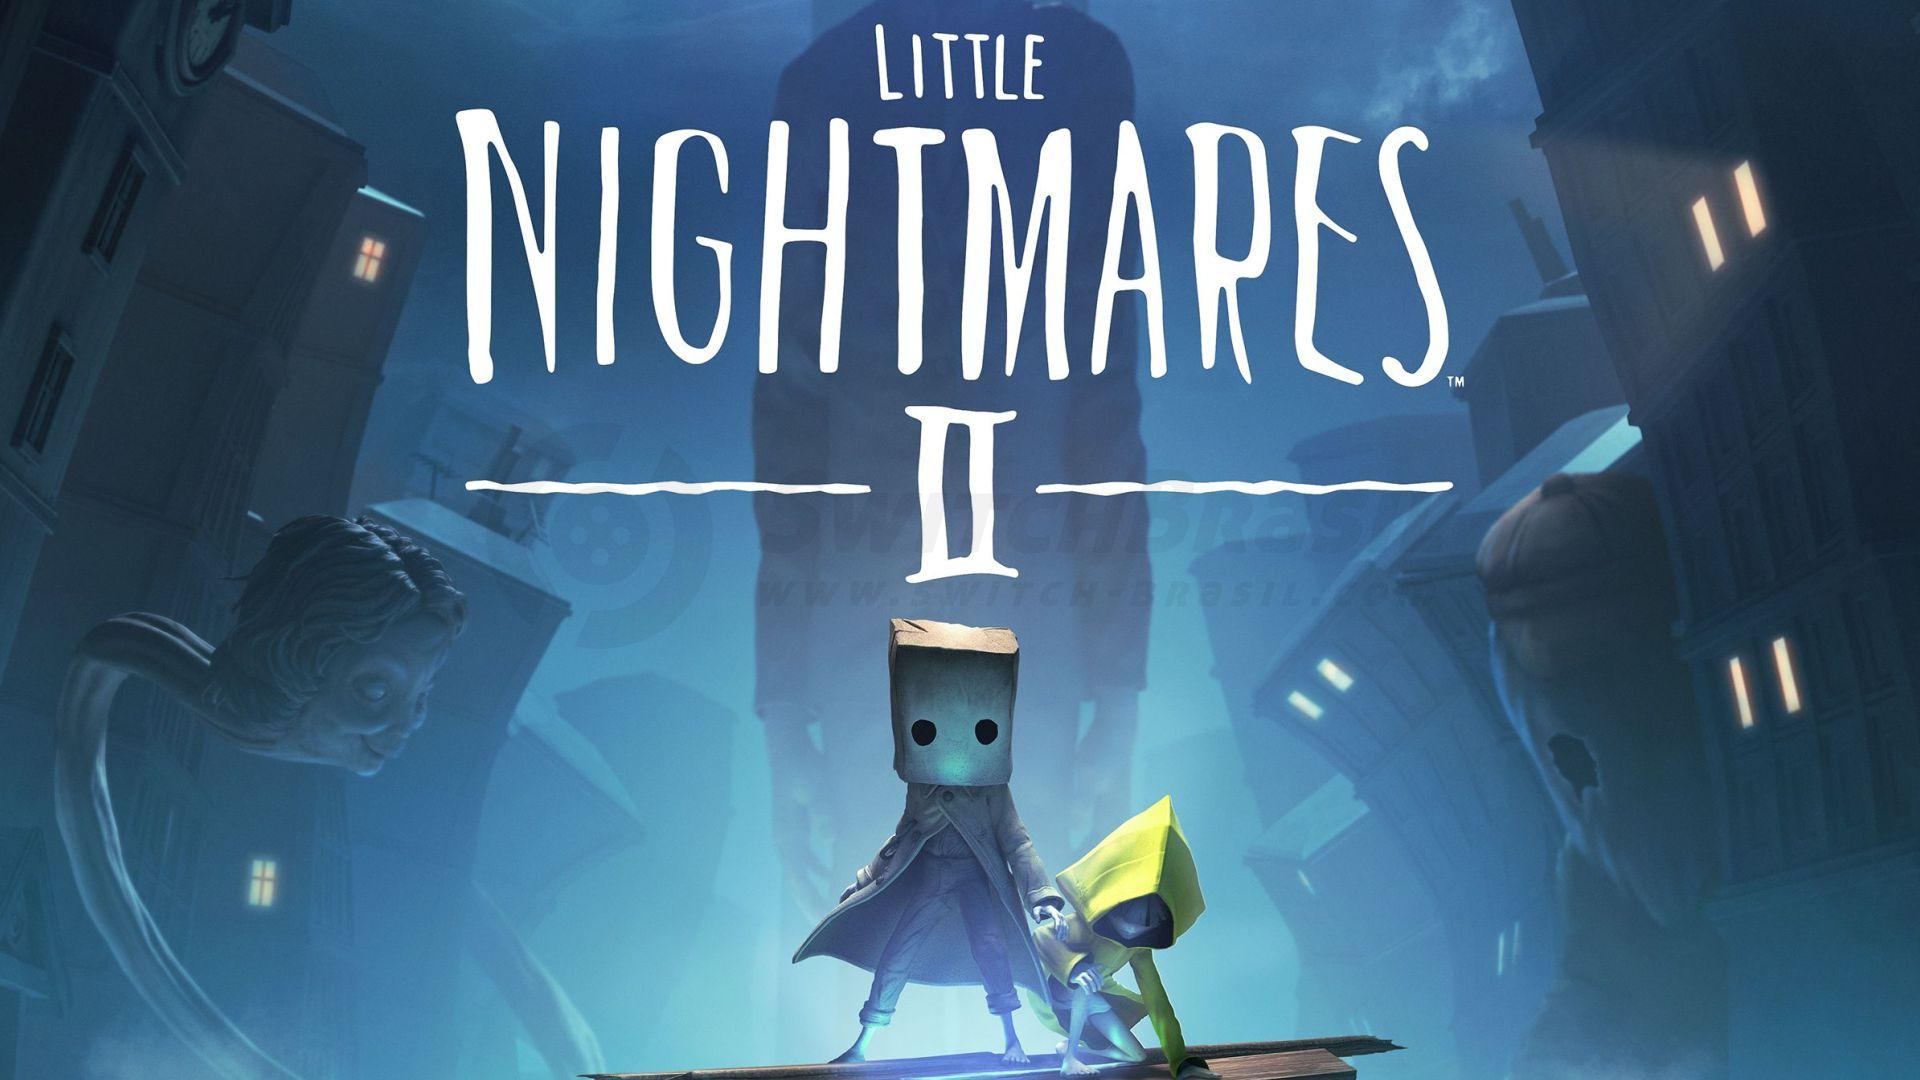 Little Nightmares II | Sequência de Little Nightmares é anunciada